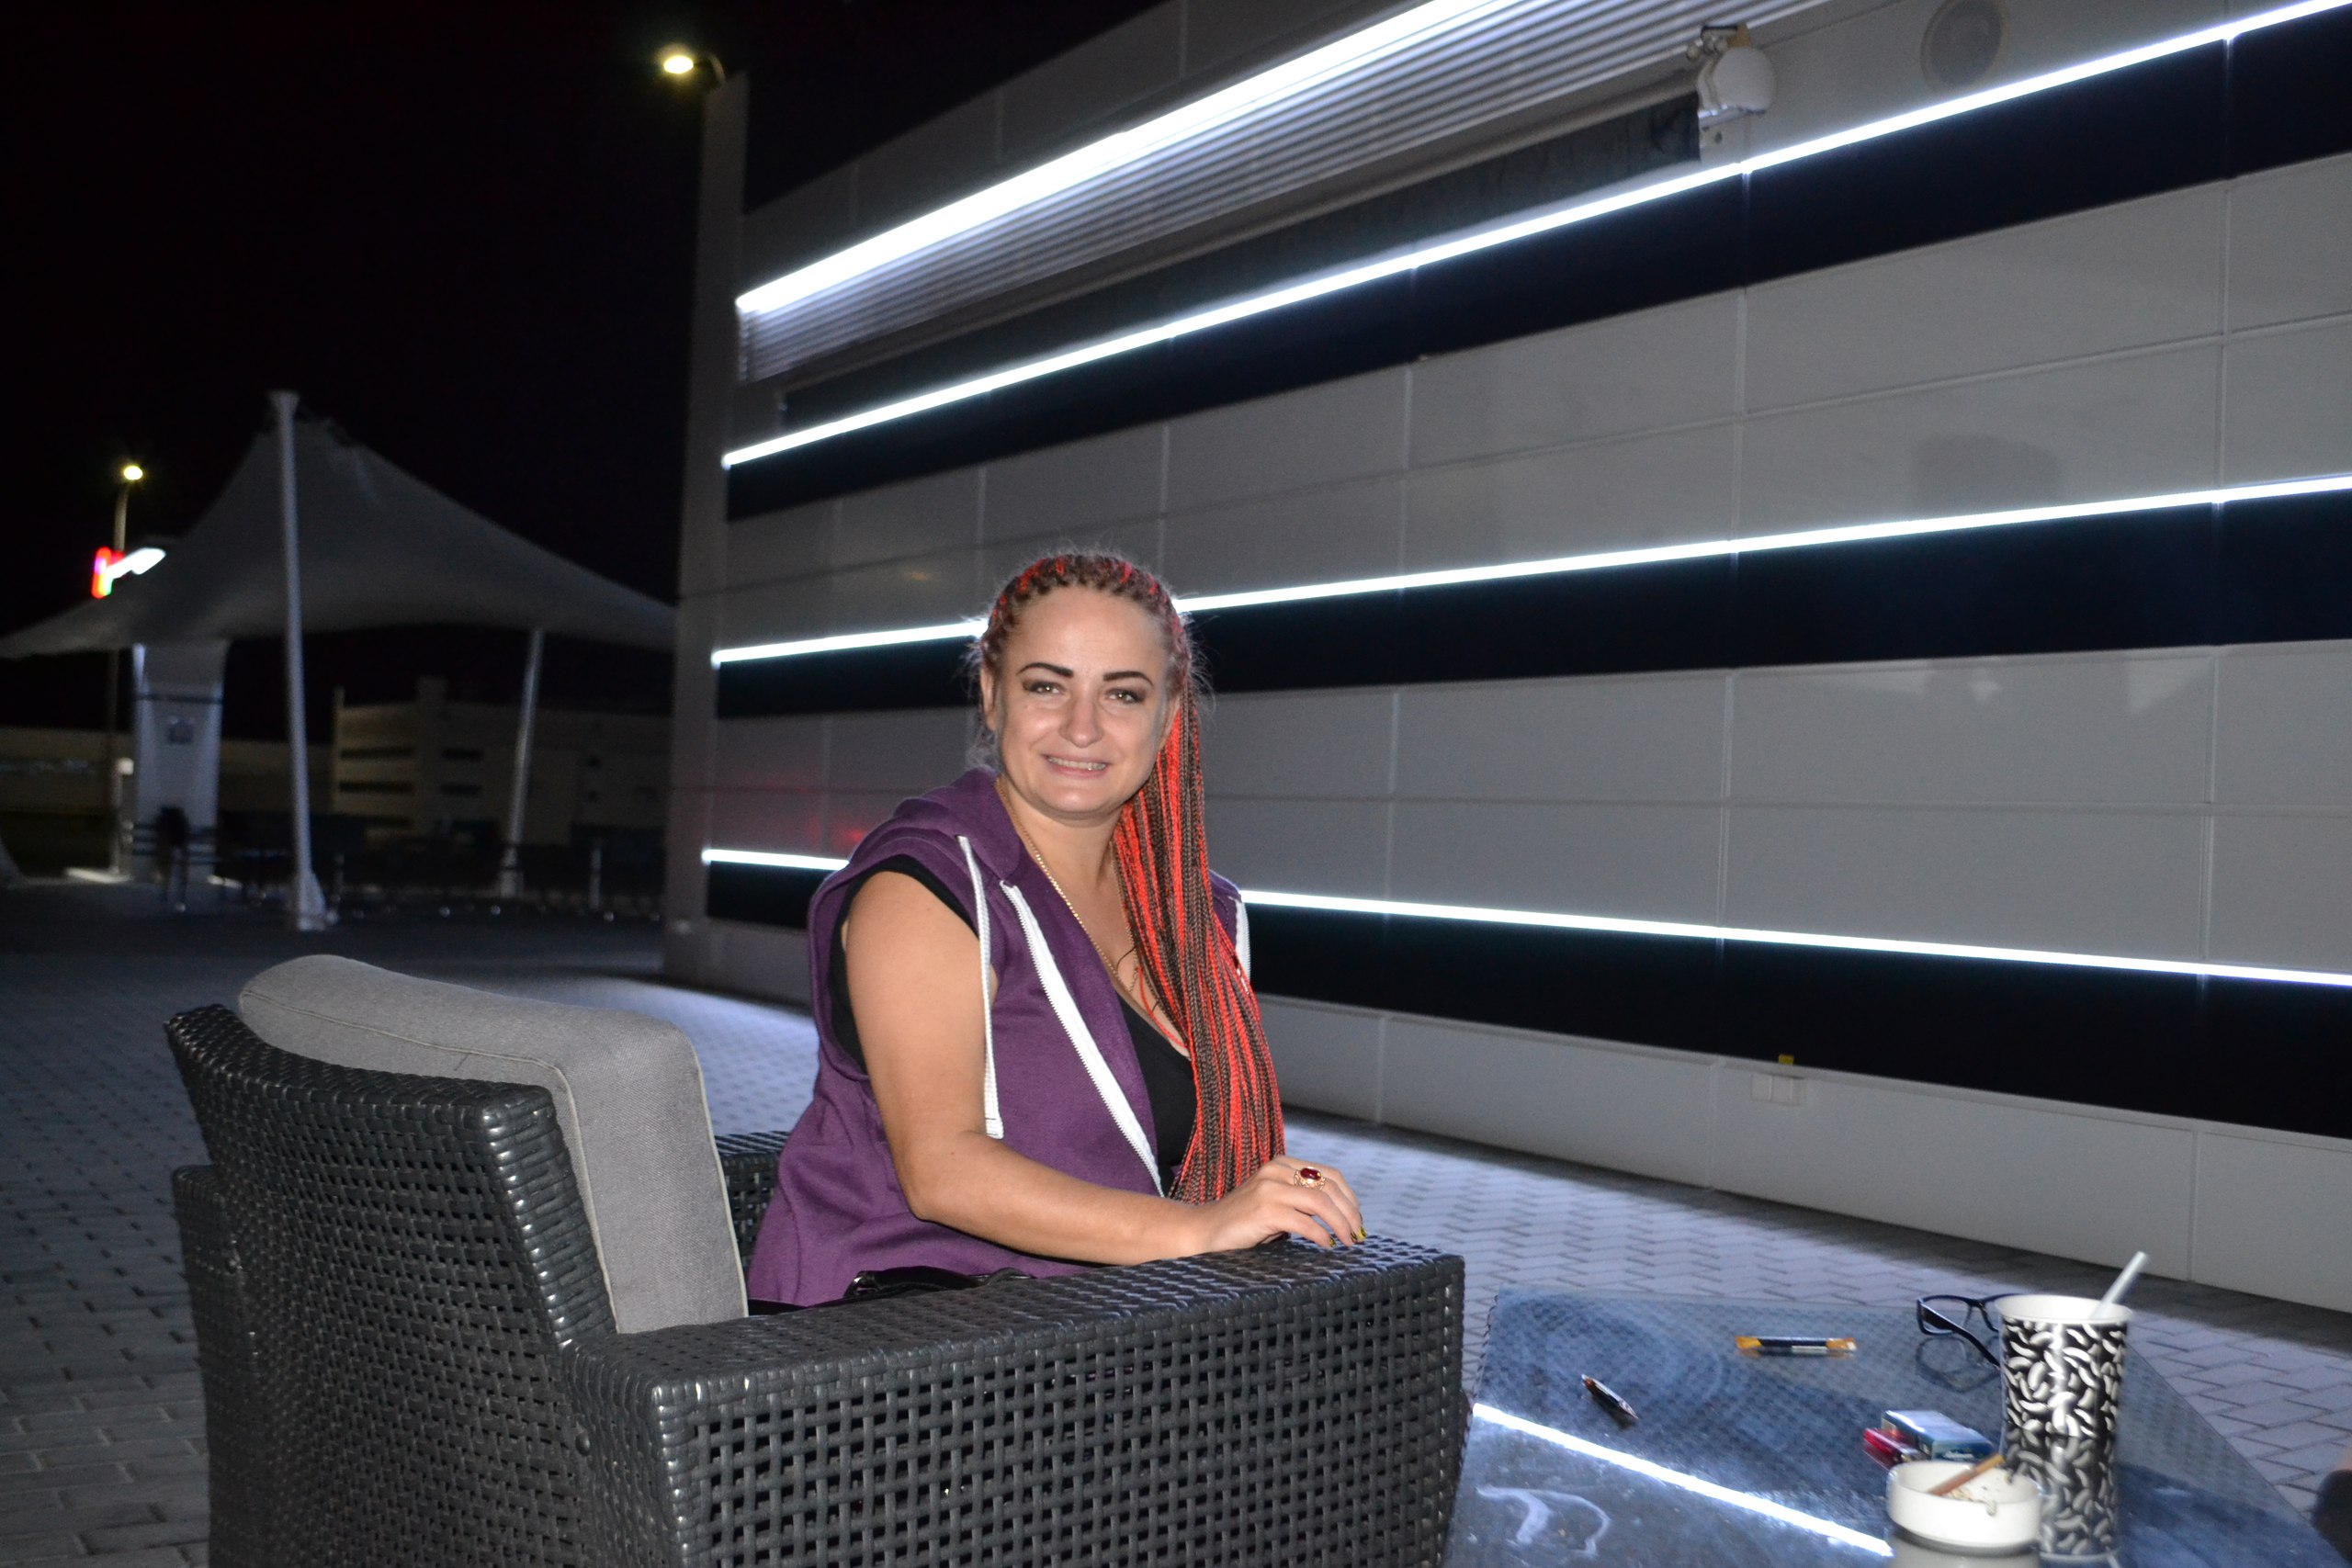 Елена Руденко (Валтея) Украина. Одесса. 17-21 августа 2016 г. FSUeOhHiQyU